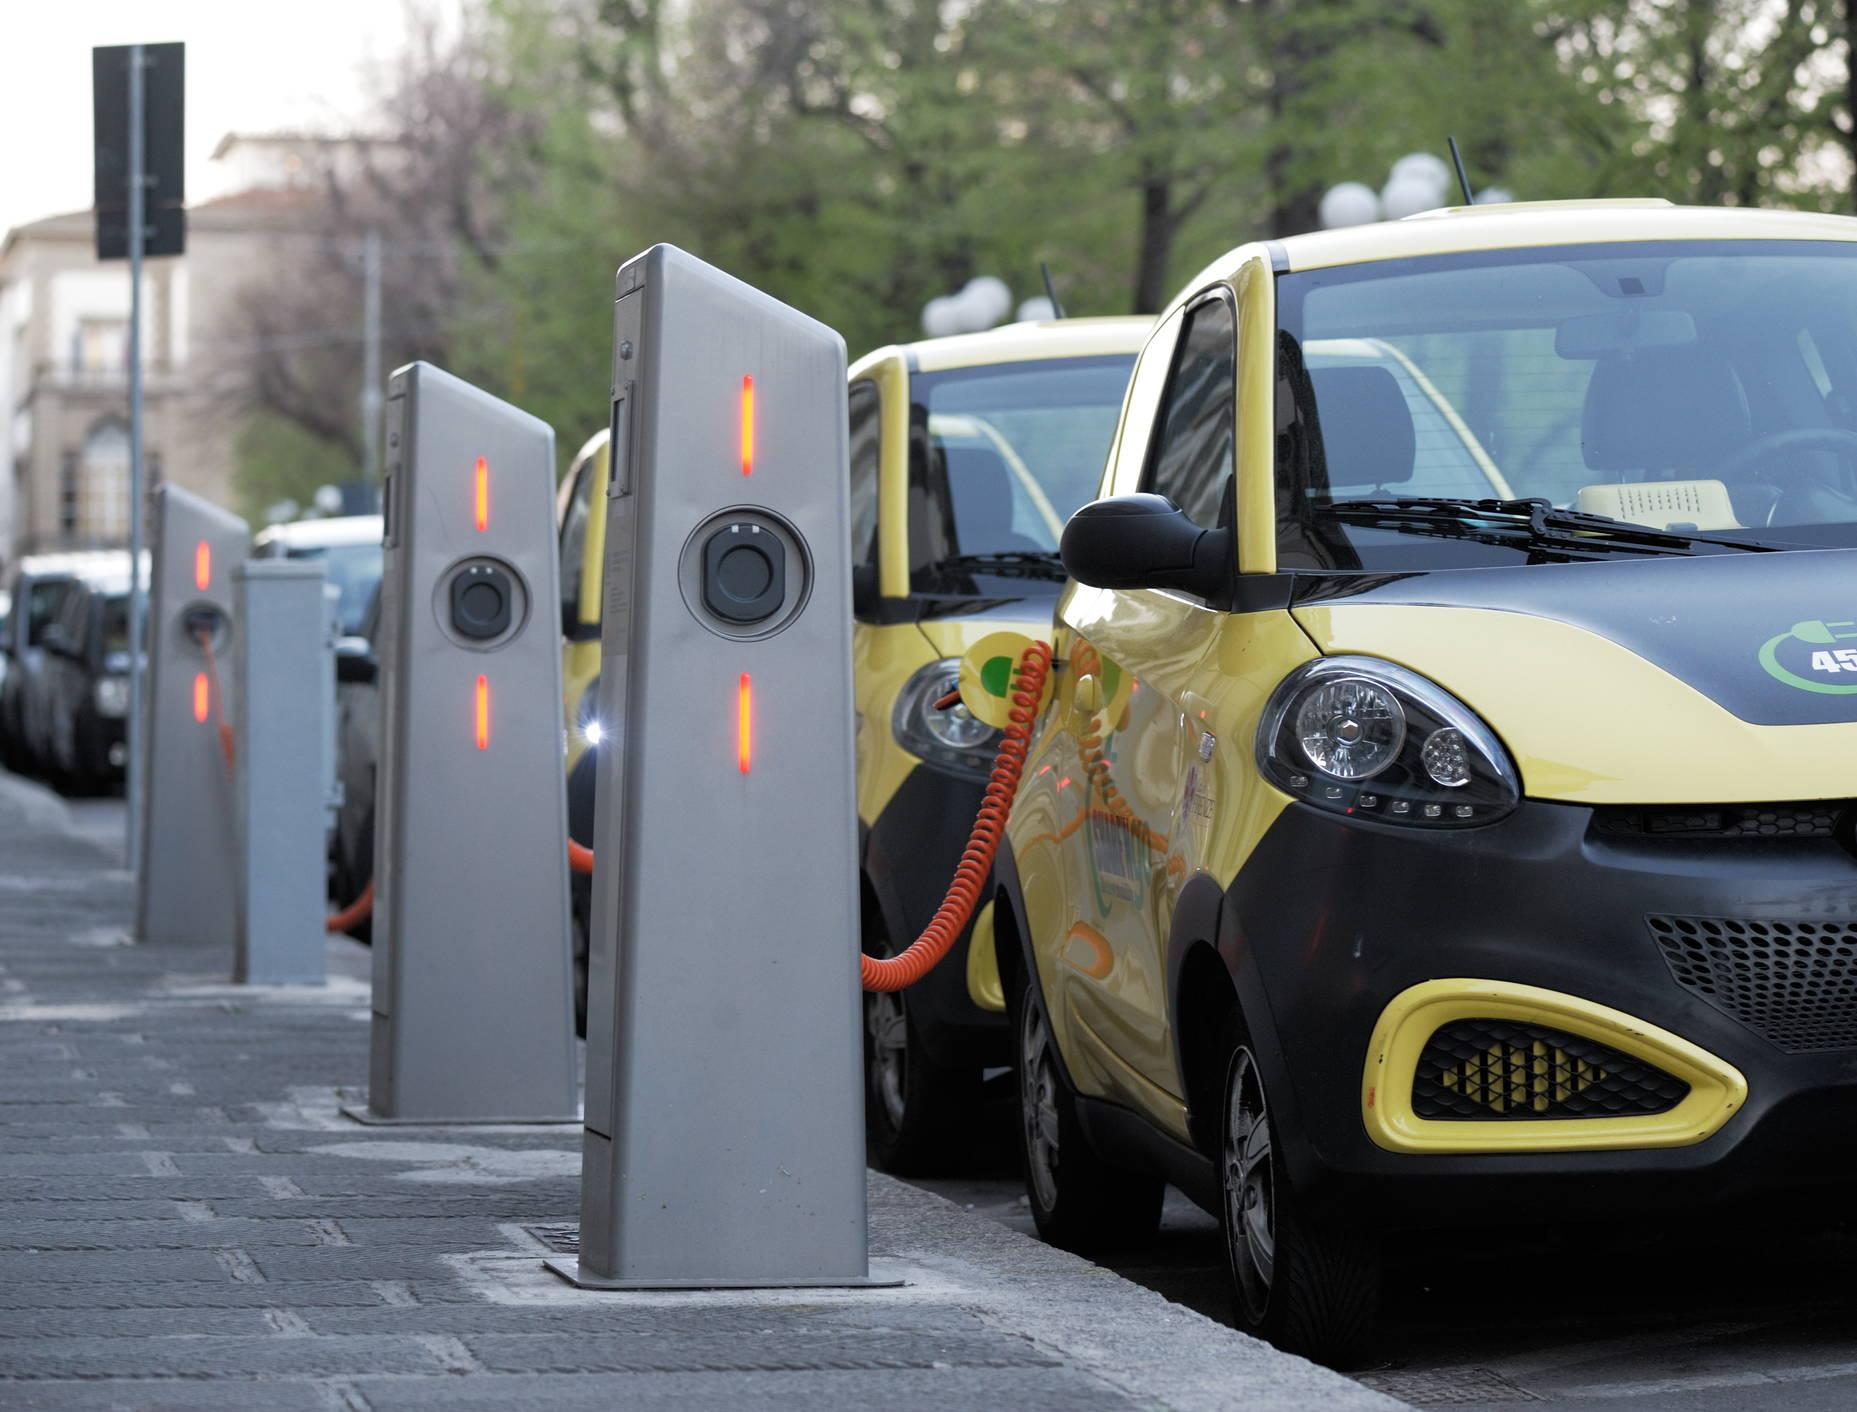 Phenomenal Intellimeter I Meter Electric Vehicle Charger Metering Amp Wiring 101 Cularstreekradiomeanderfmnl